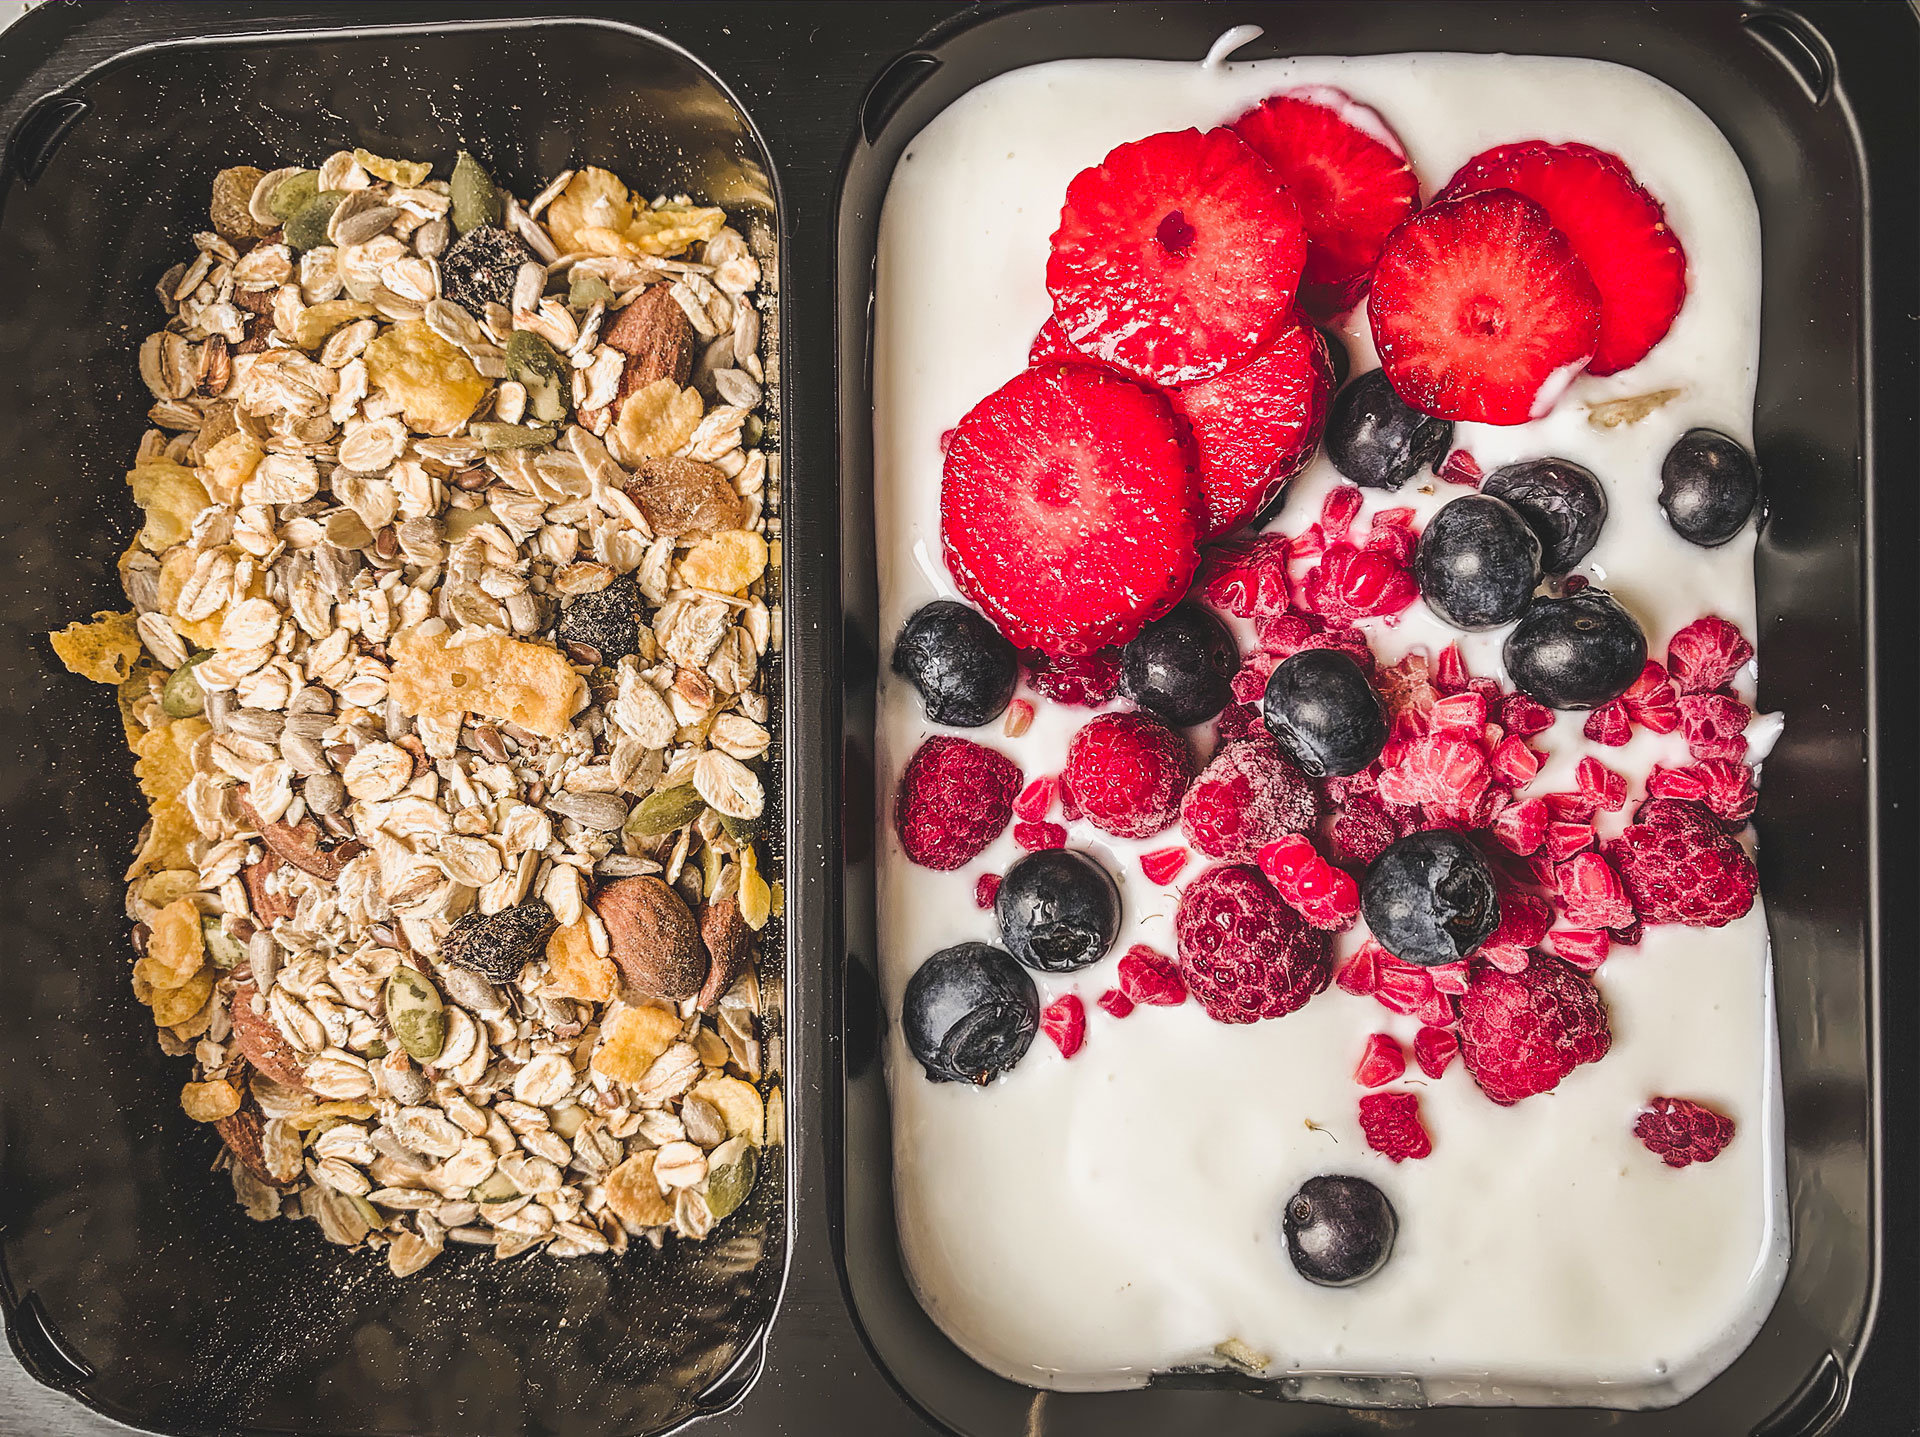 Obrazek Dieta bez glutenu i laktozy na 20 dni 2000 kalorii